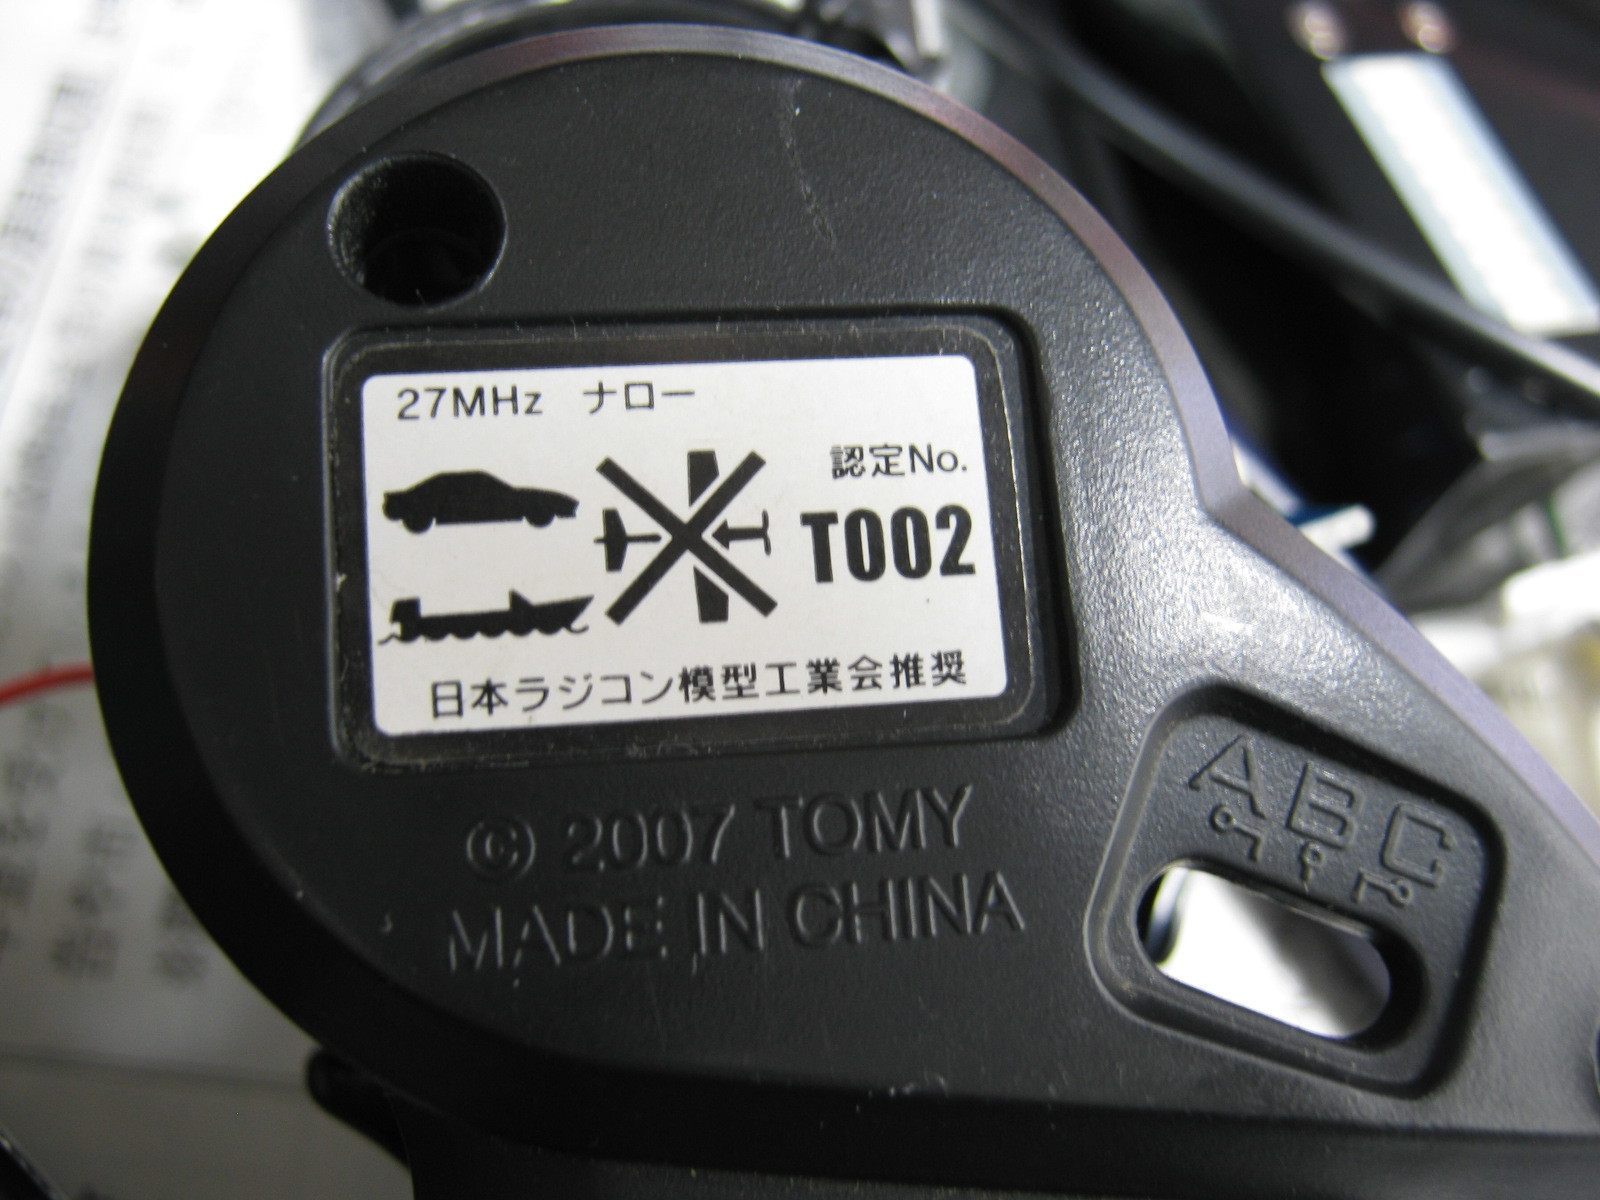 27MHzFM方式トイラジ(送信機)